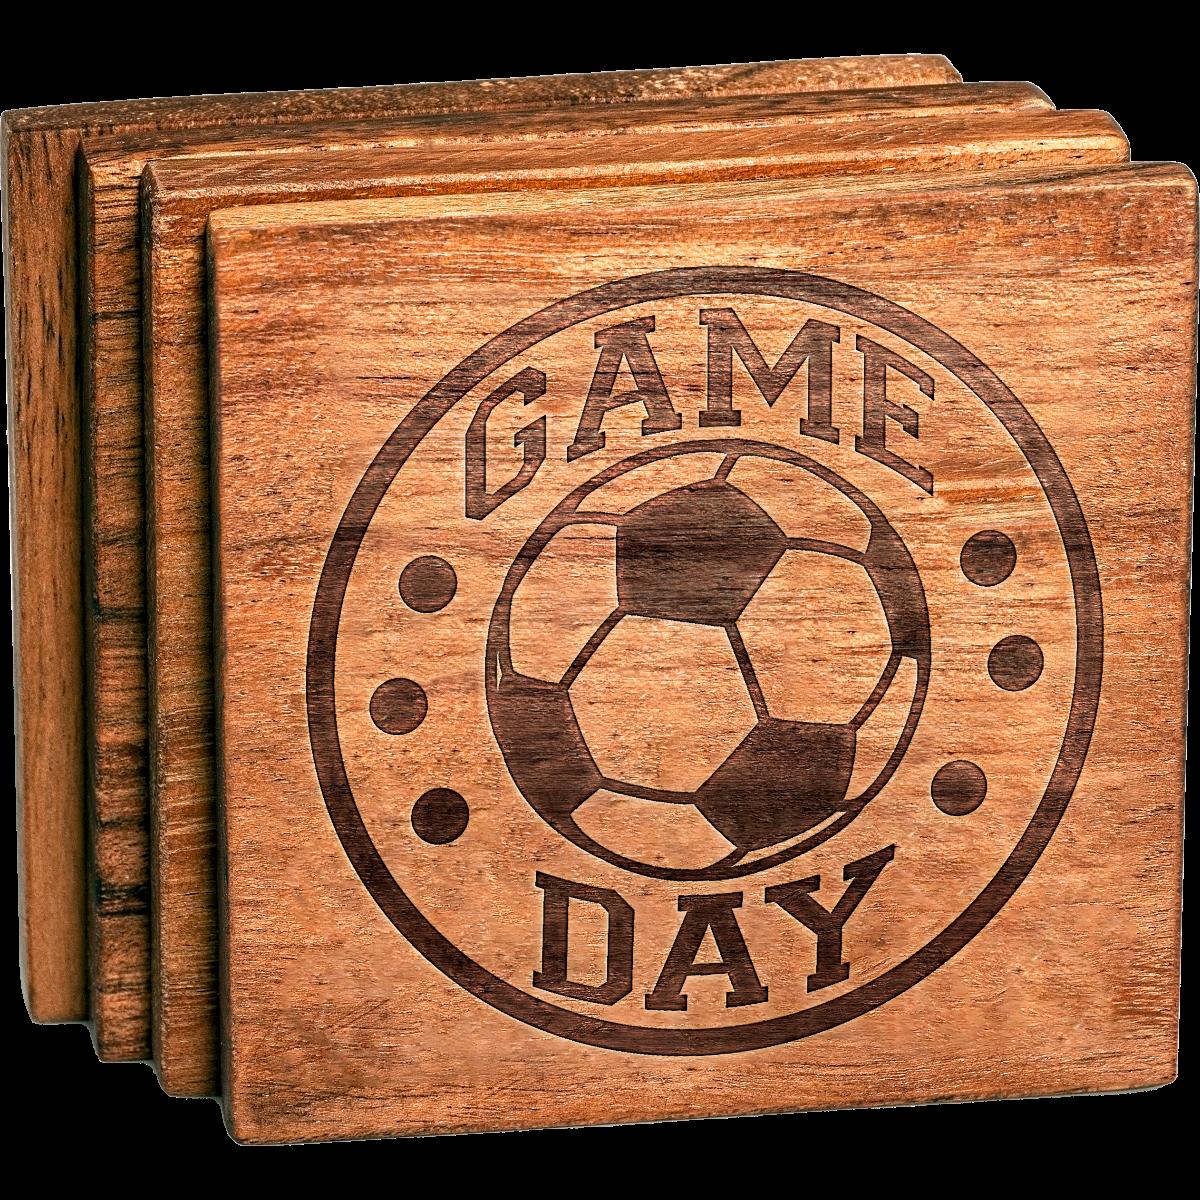 Soccer Game Day Coaster Set